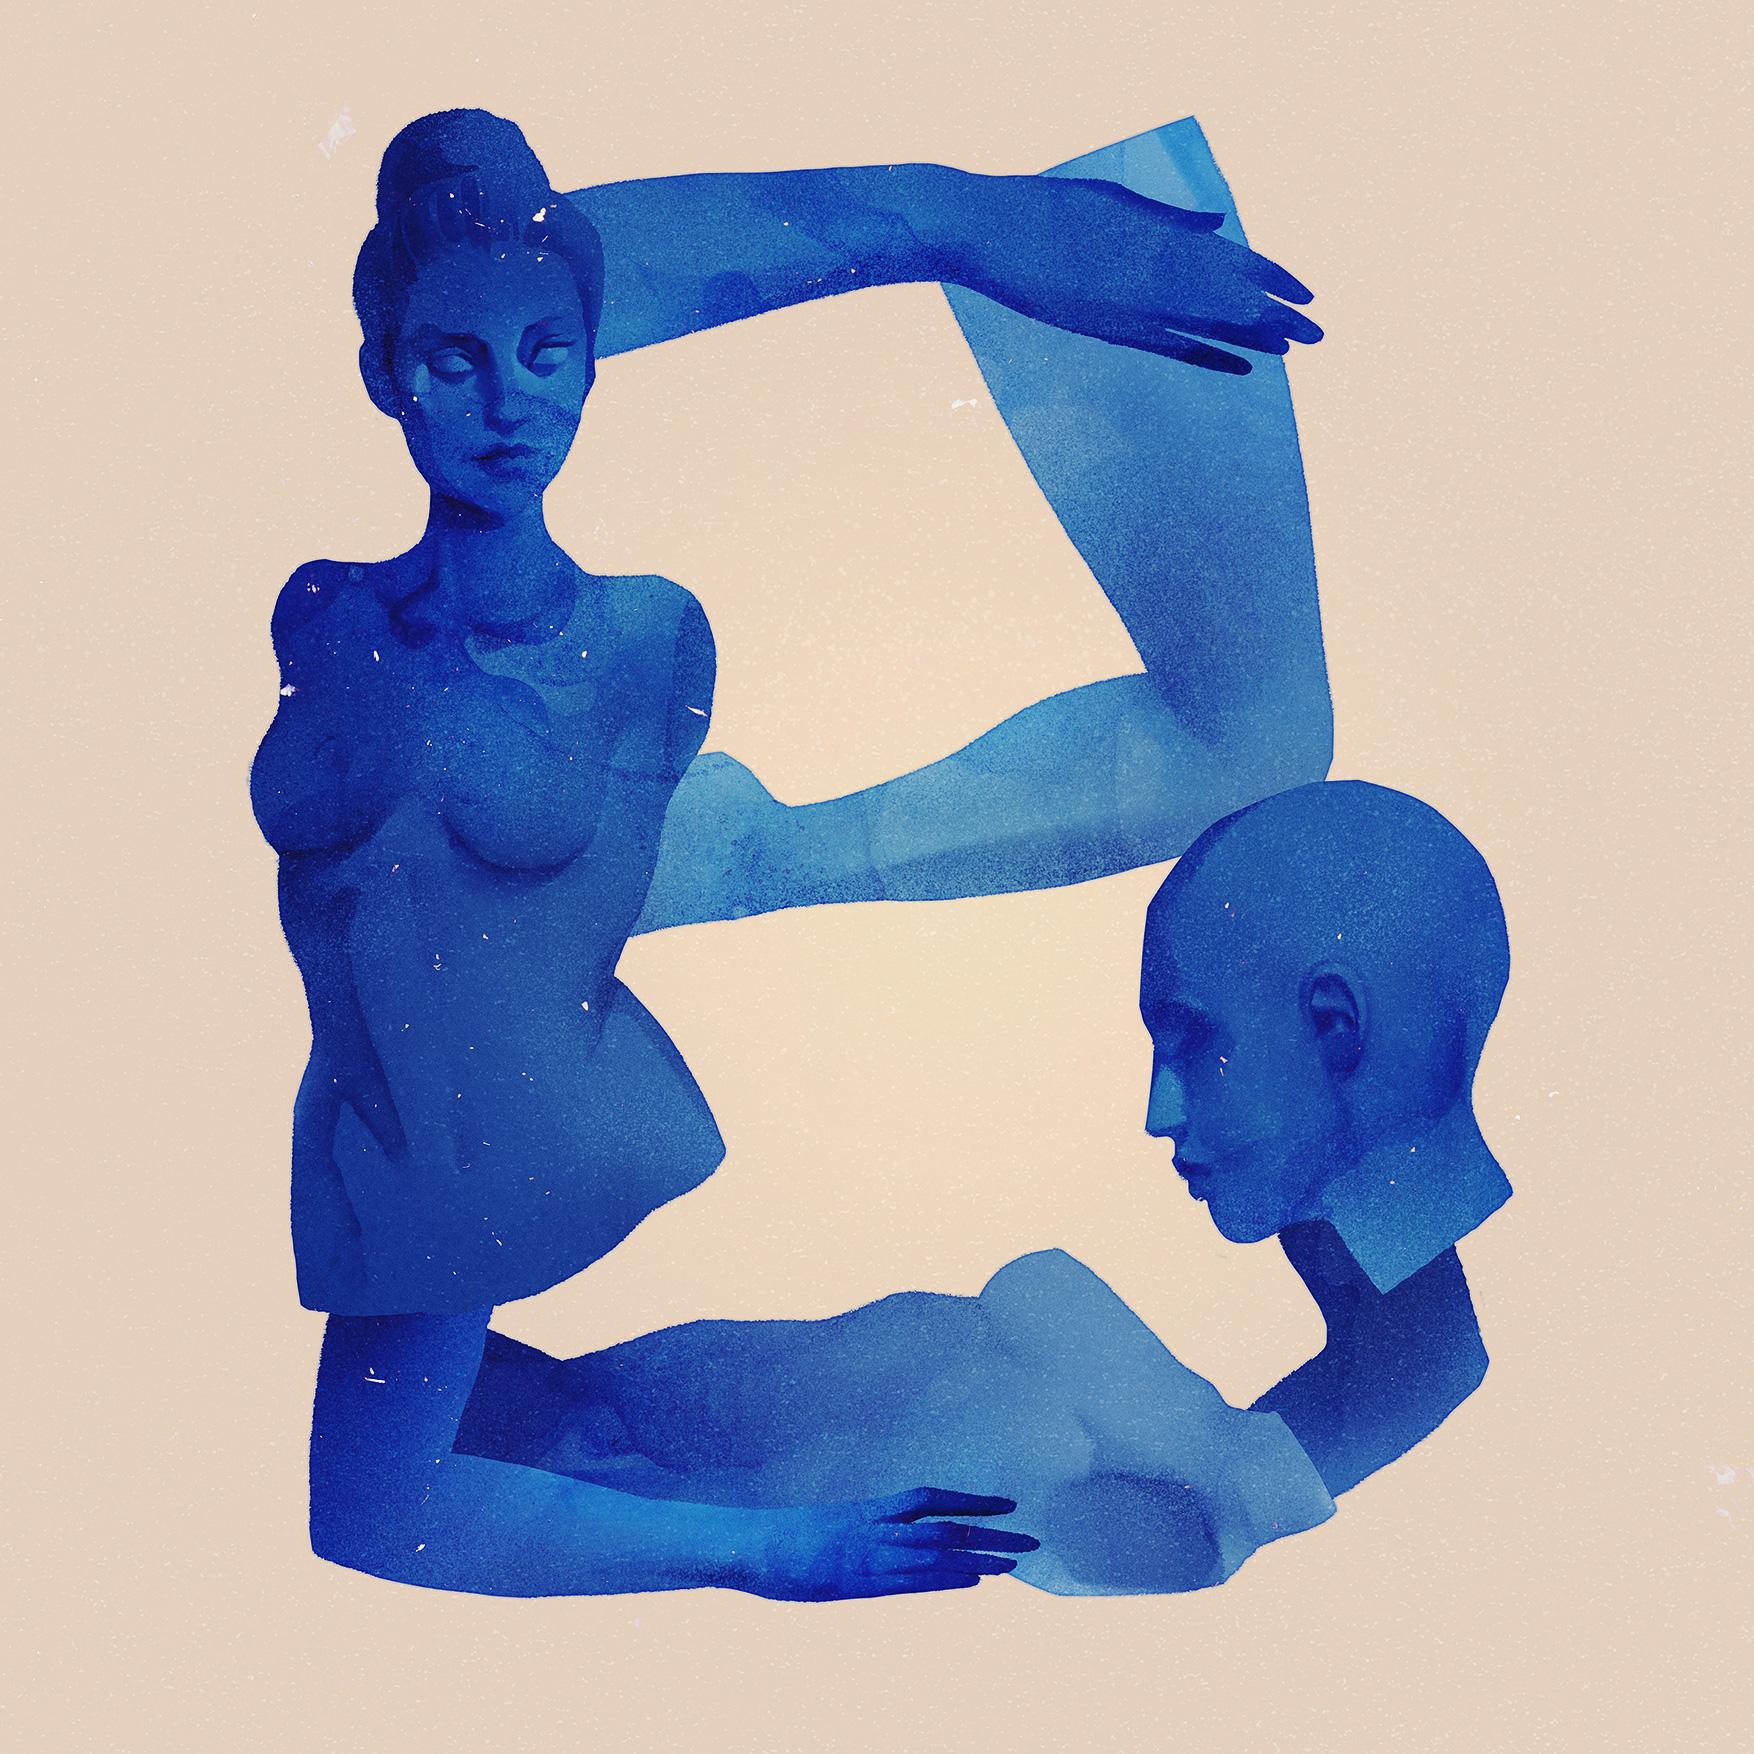 B - BLUE / YVES KLEIN